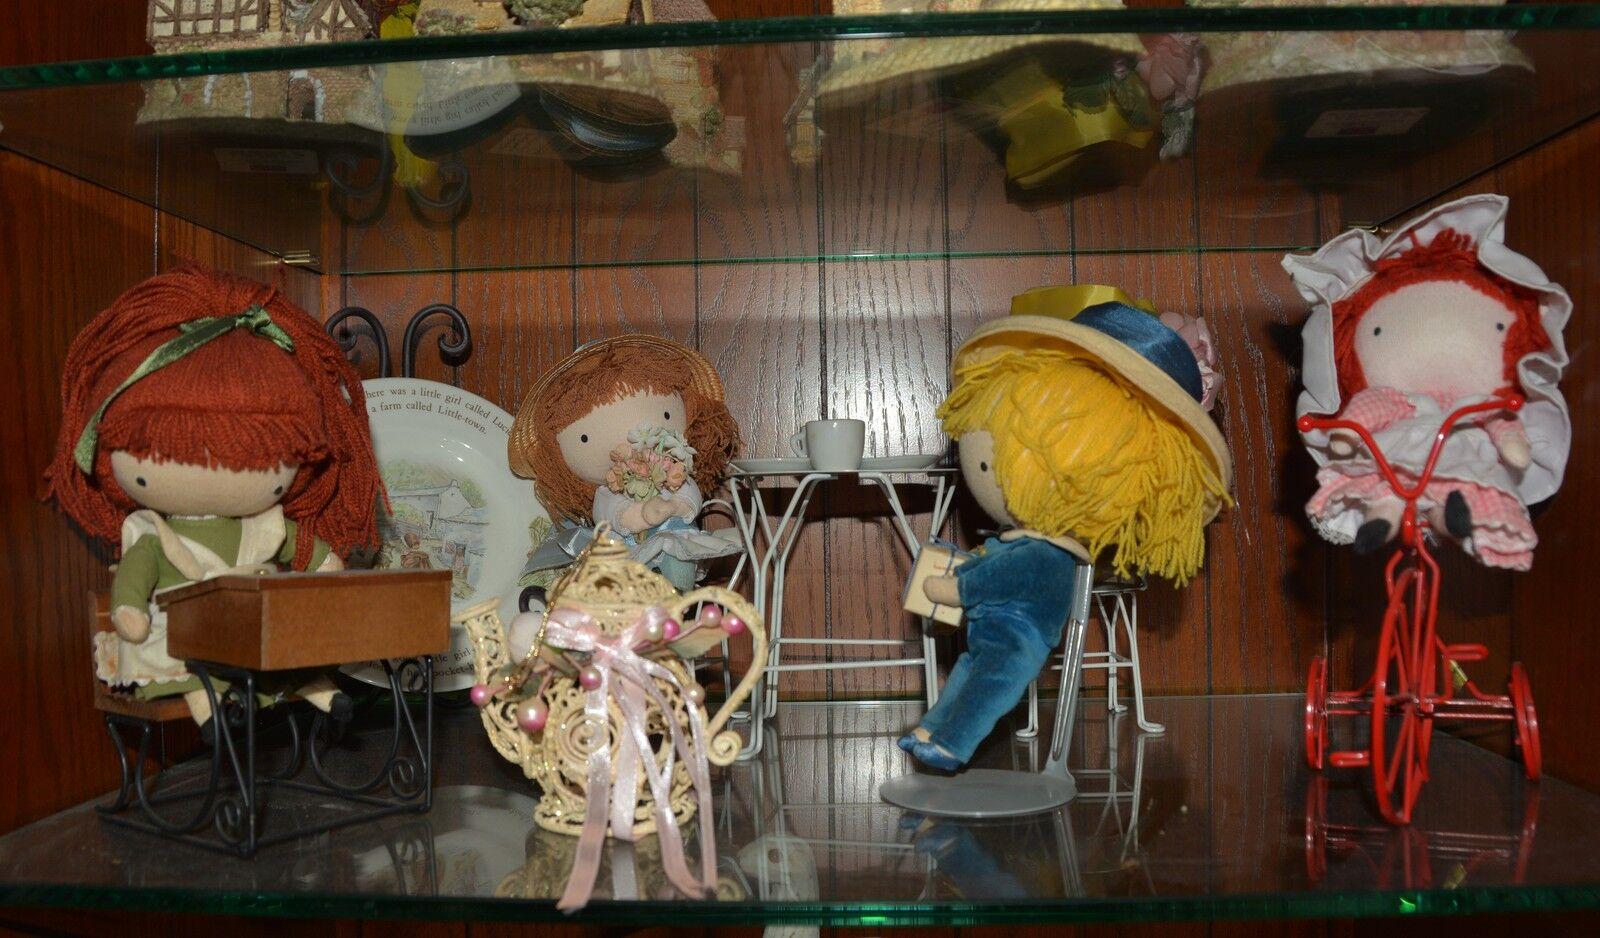 The Schropp Shoppe